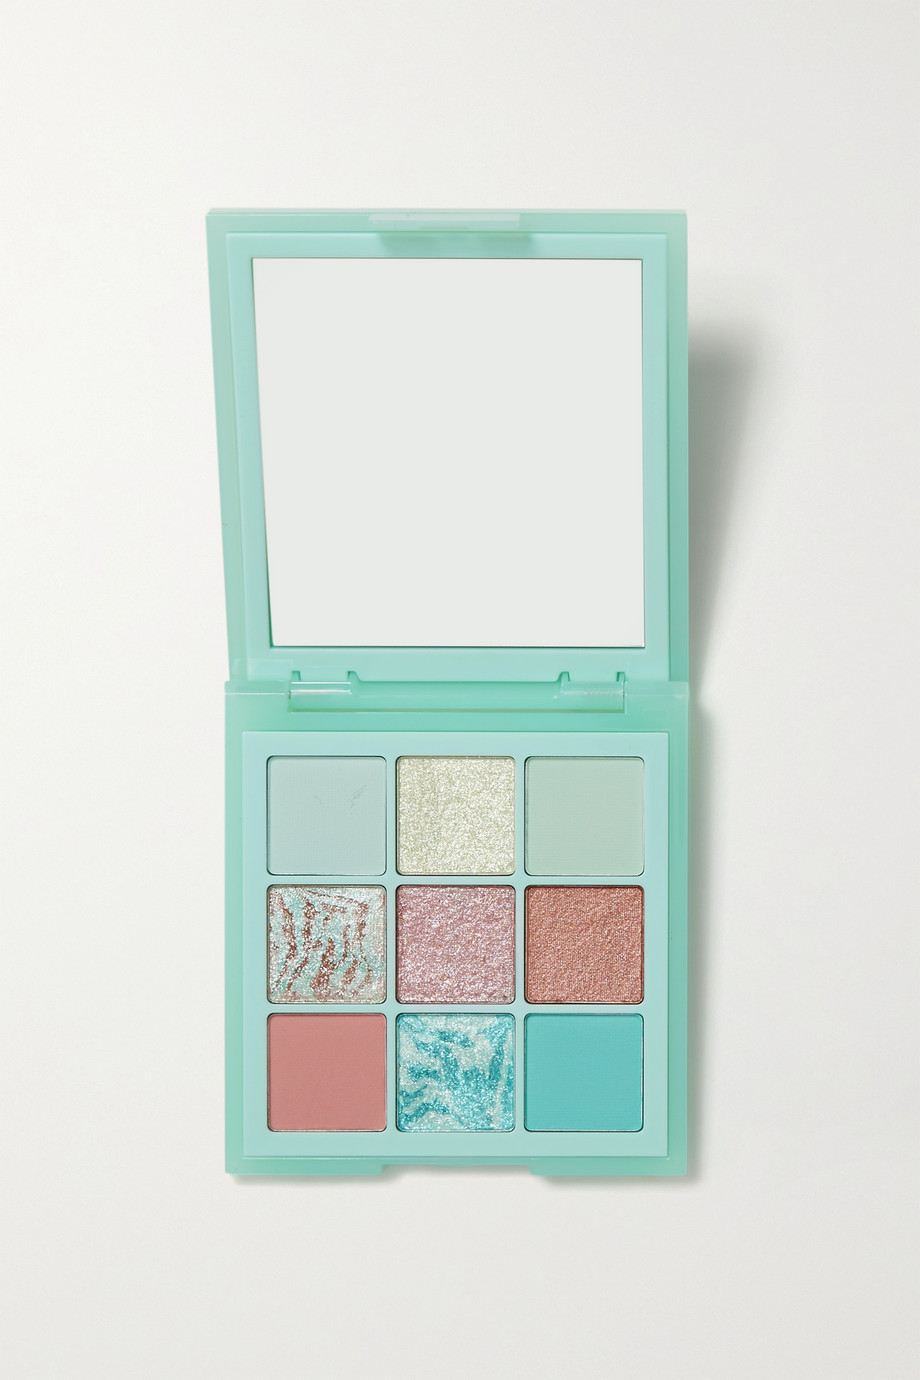 Huda Beauty Pastel Obsessions Eyeshadow Palette - Mint